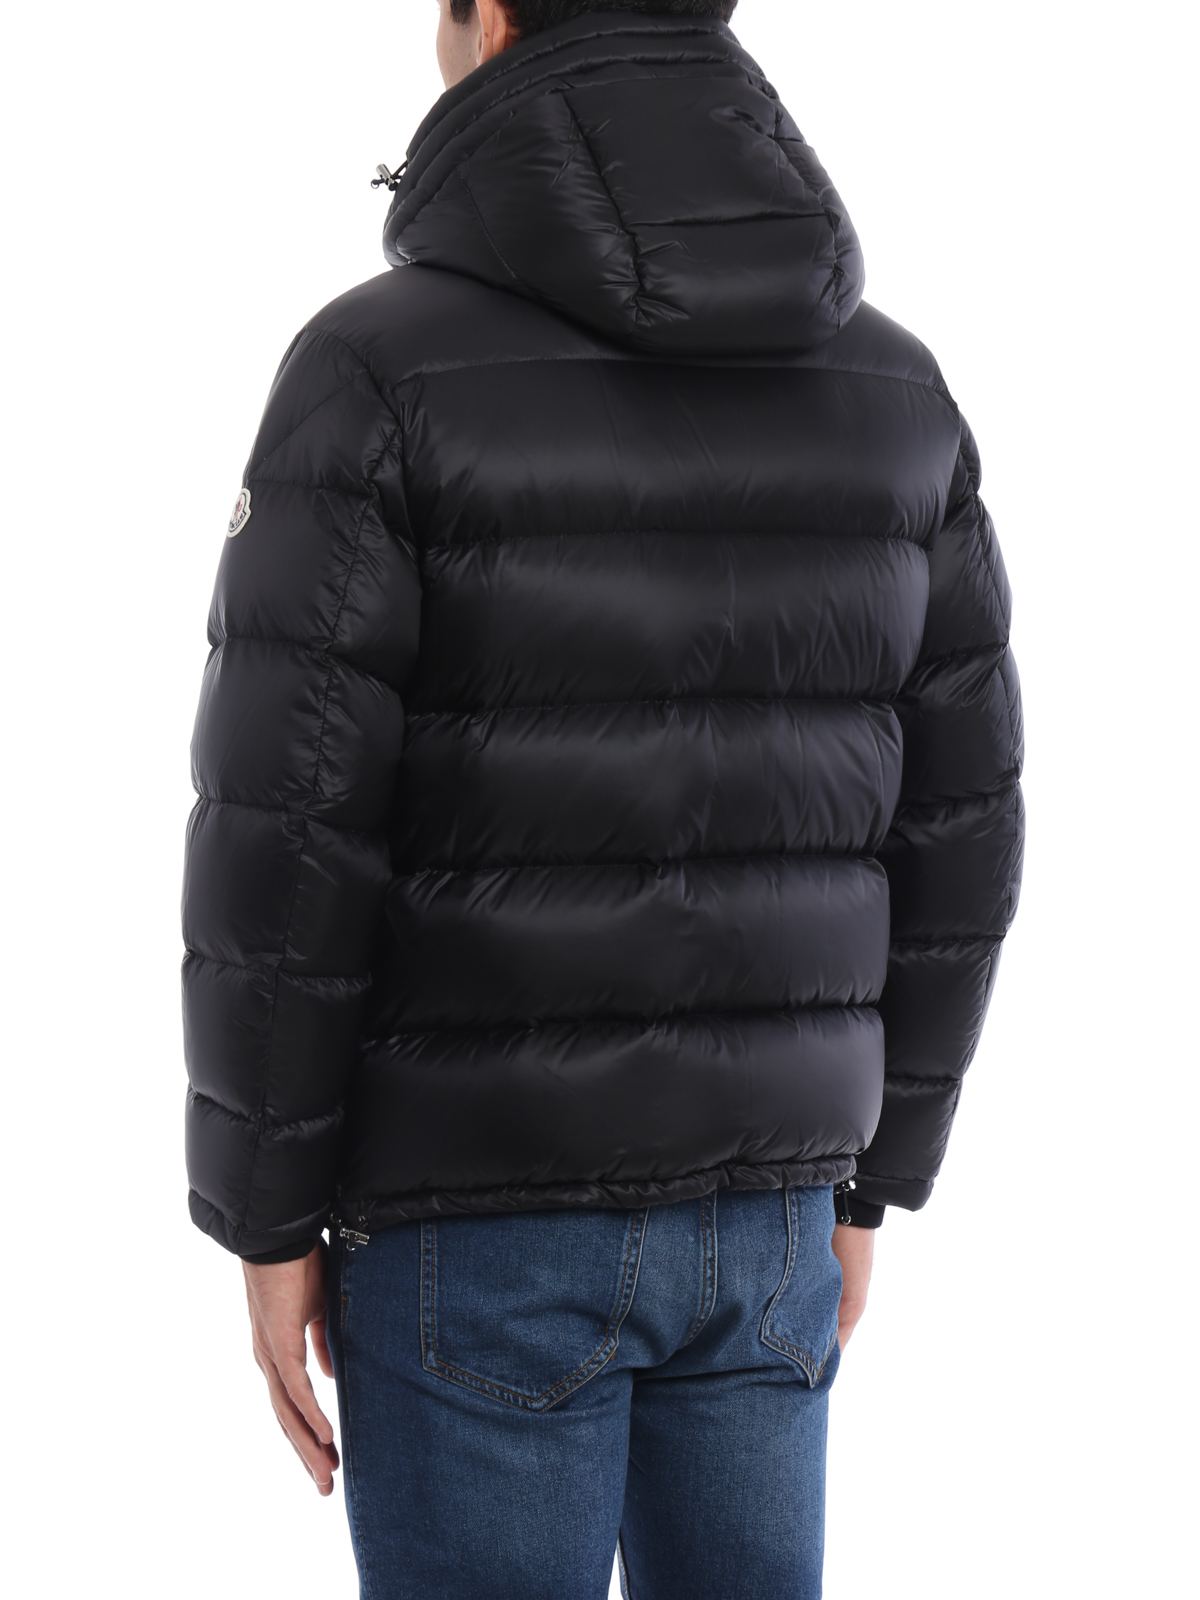 ea6d81b5b7a Moncler - Pascal padded jacket - padded jackets - C2 091 4193605 ...